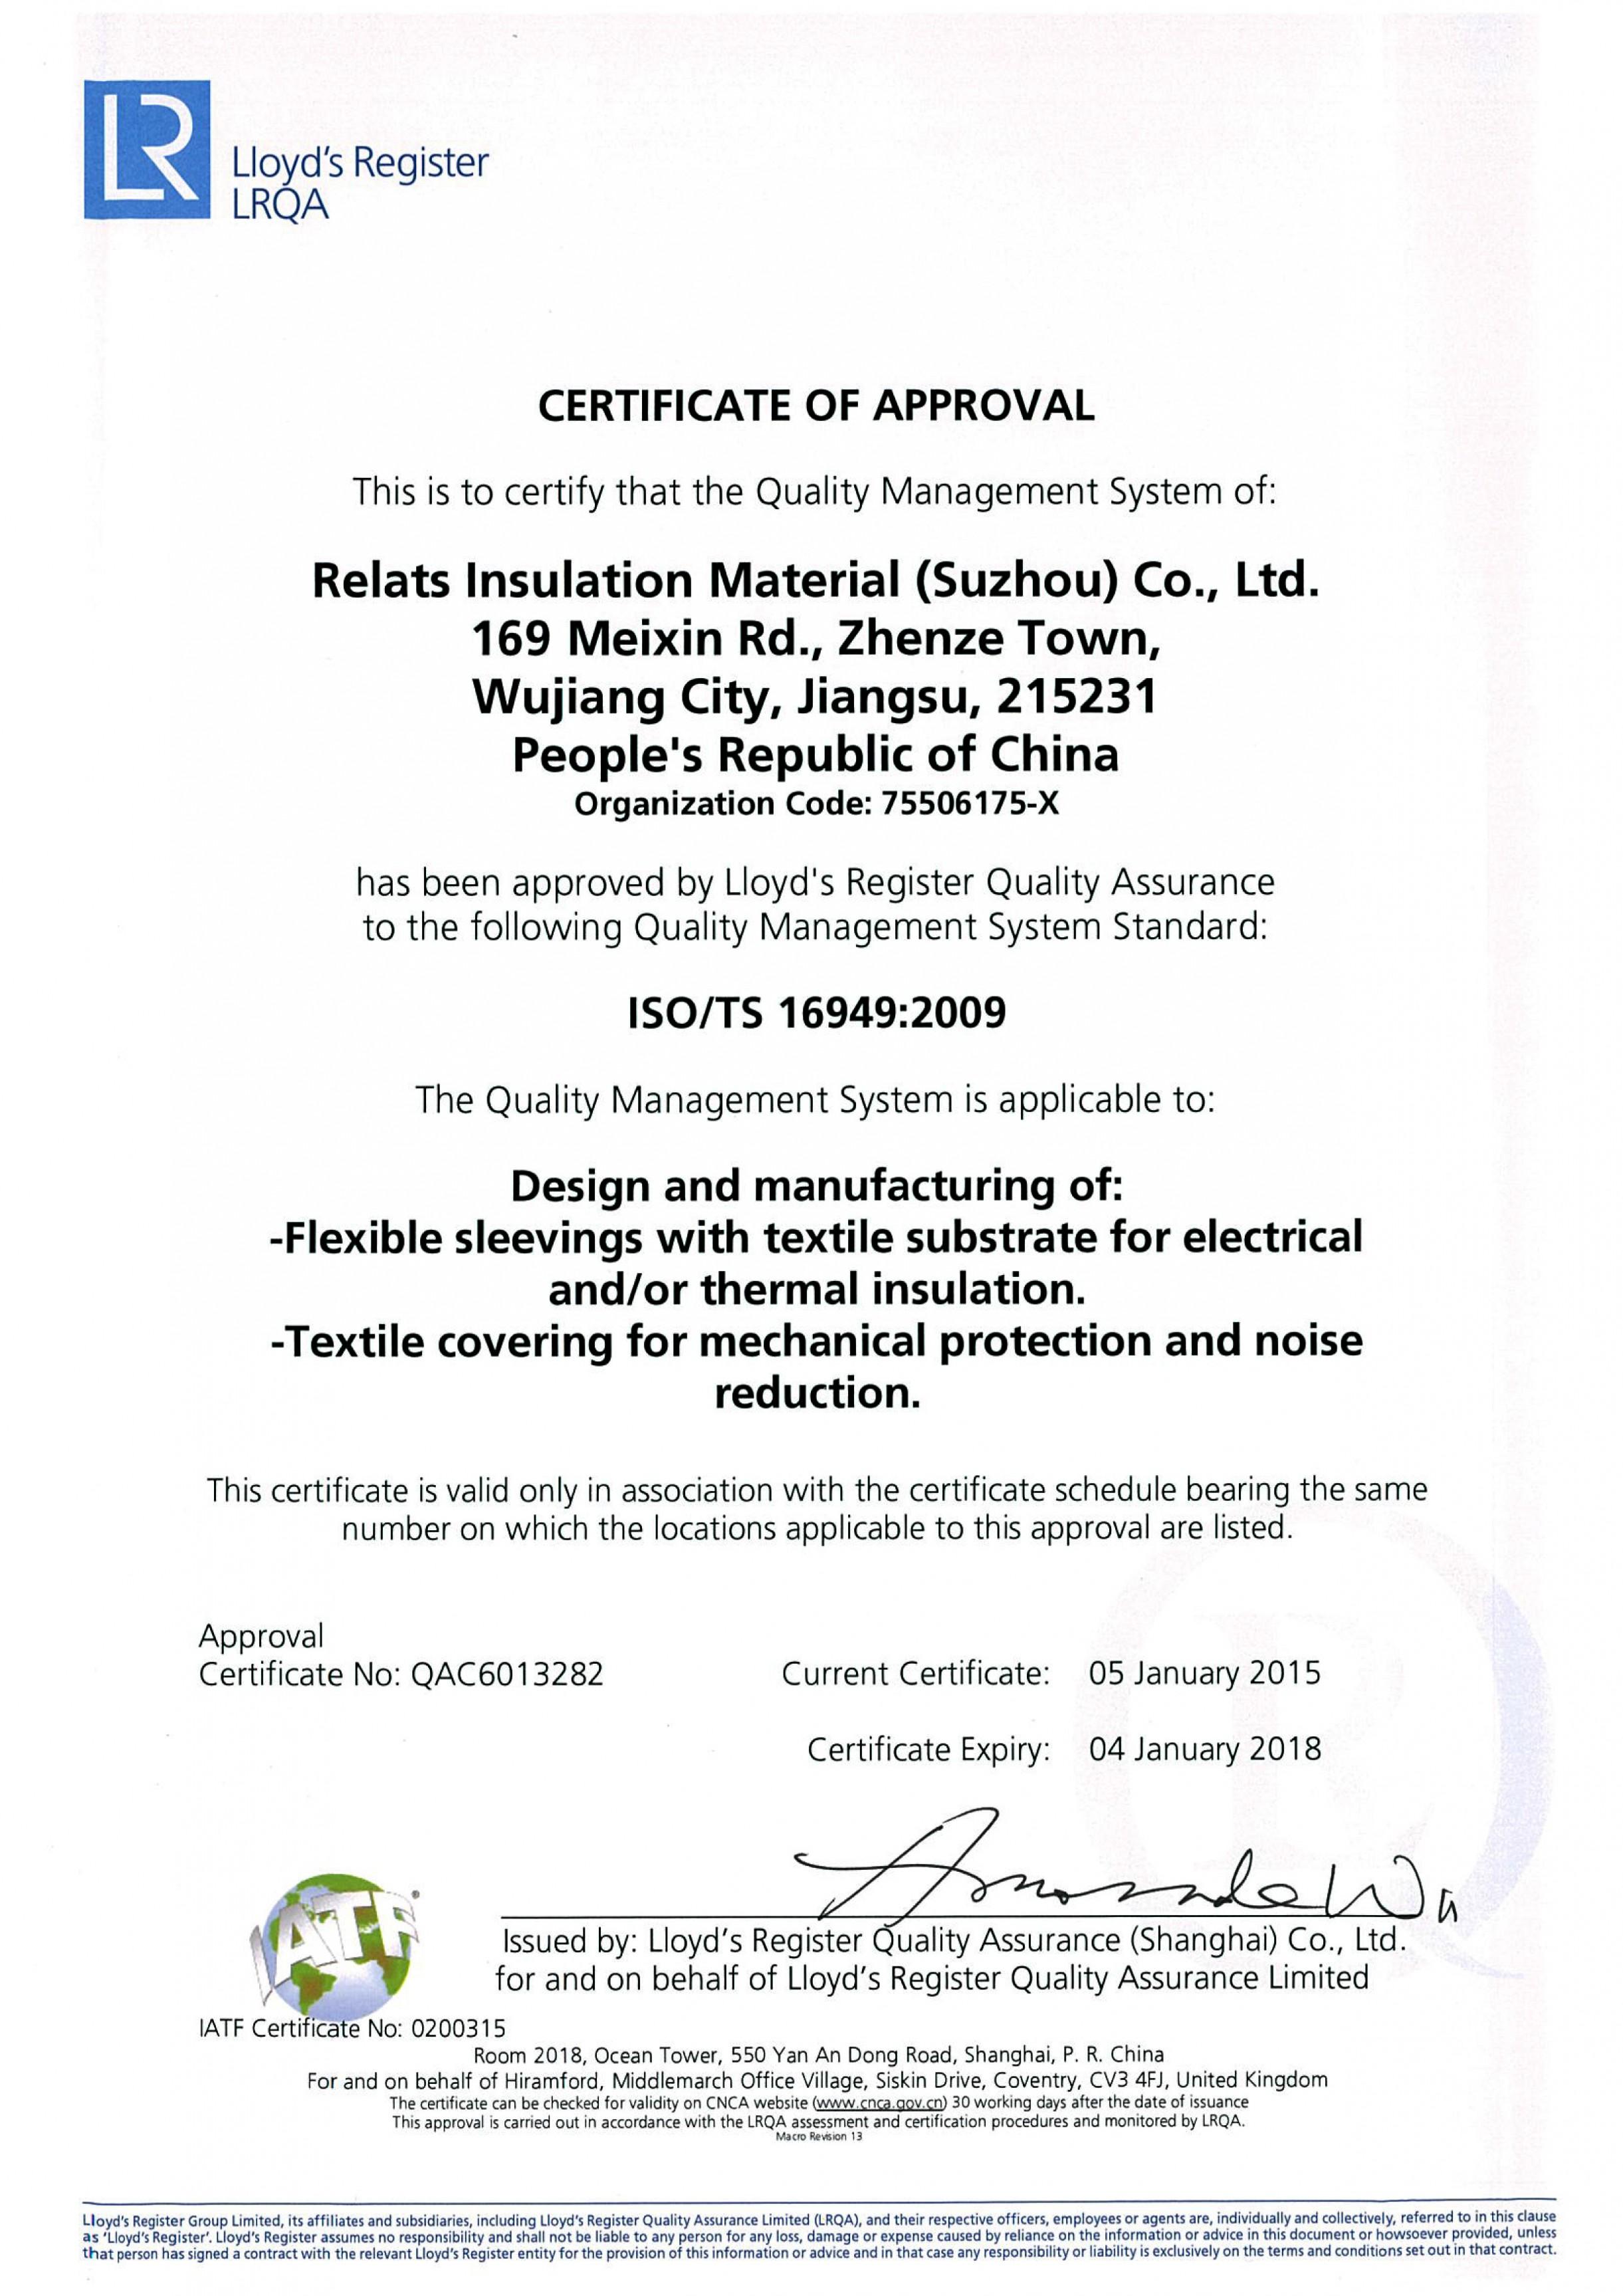 ISO/TS 16949:2009 Certificat RelatsXina